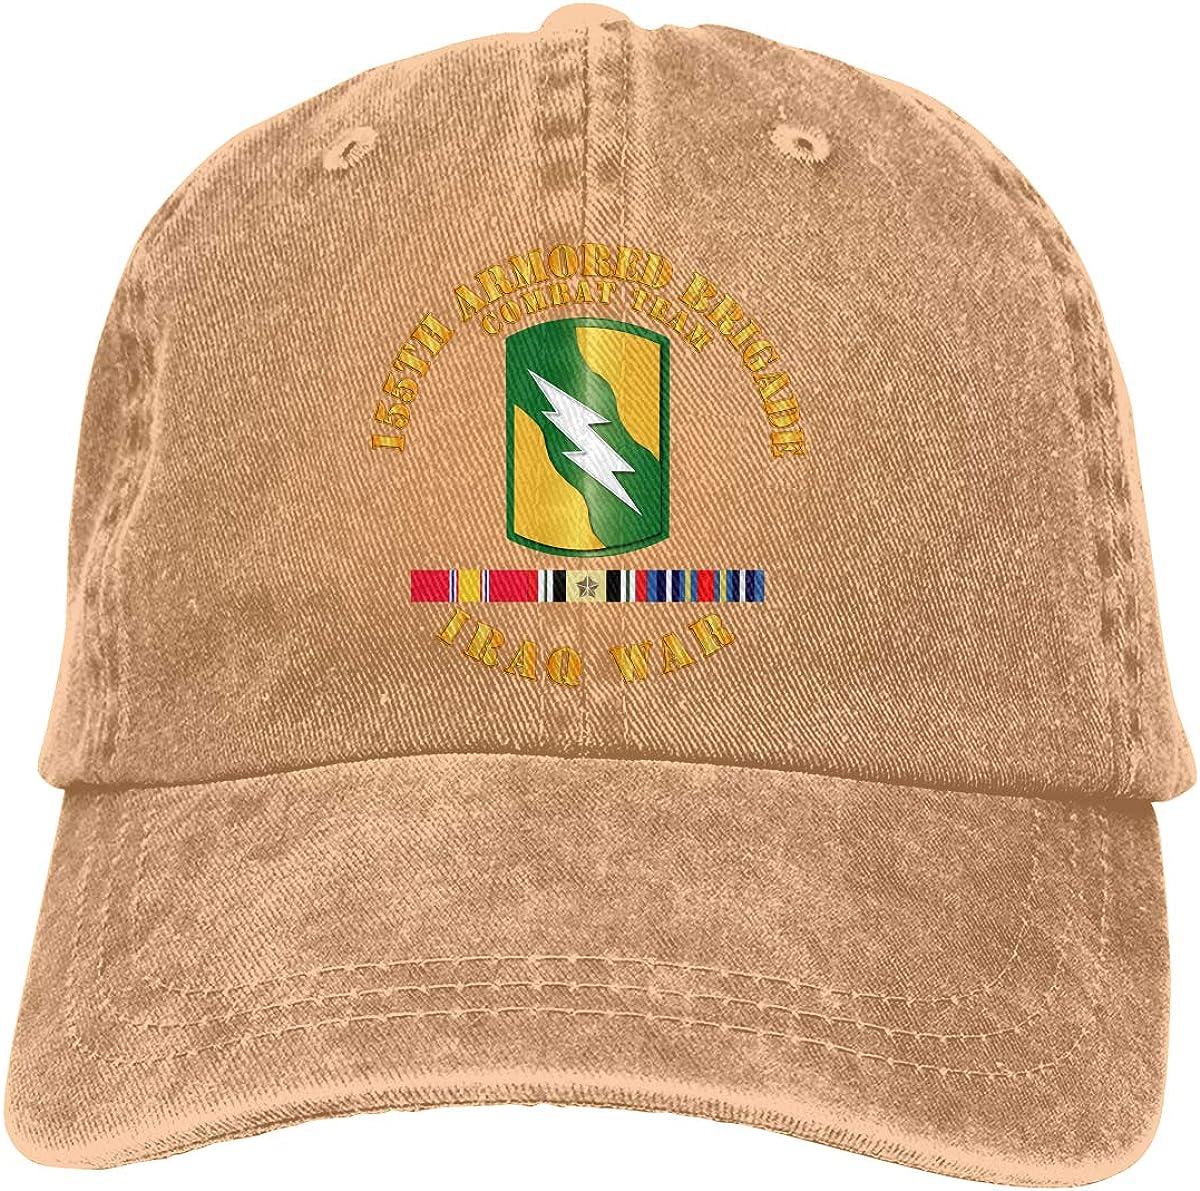 155th Armored BCT Iraq War SVC Ribbons Adjustable Baseball Caps Denim Hats Cowboy Sport Outdoor